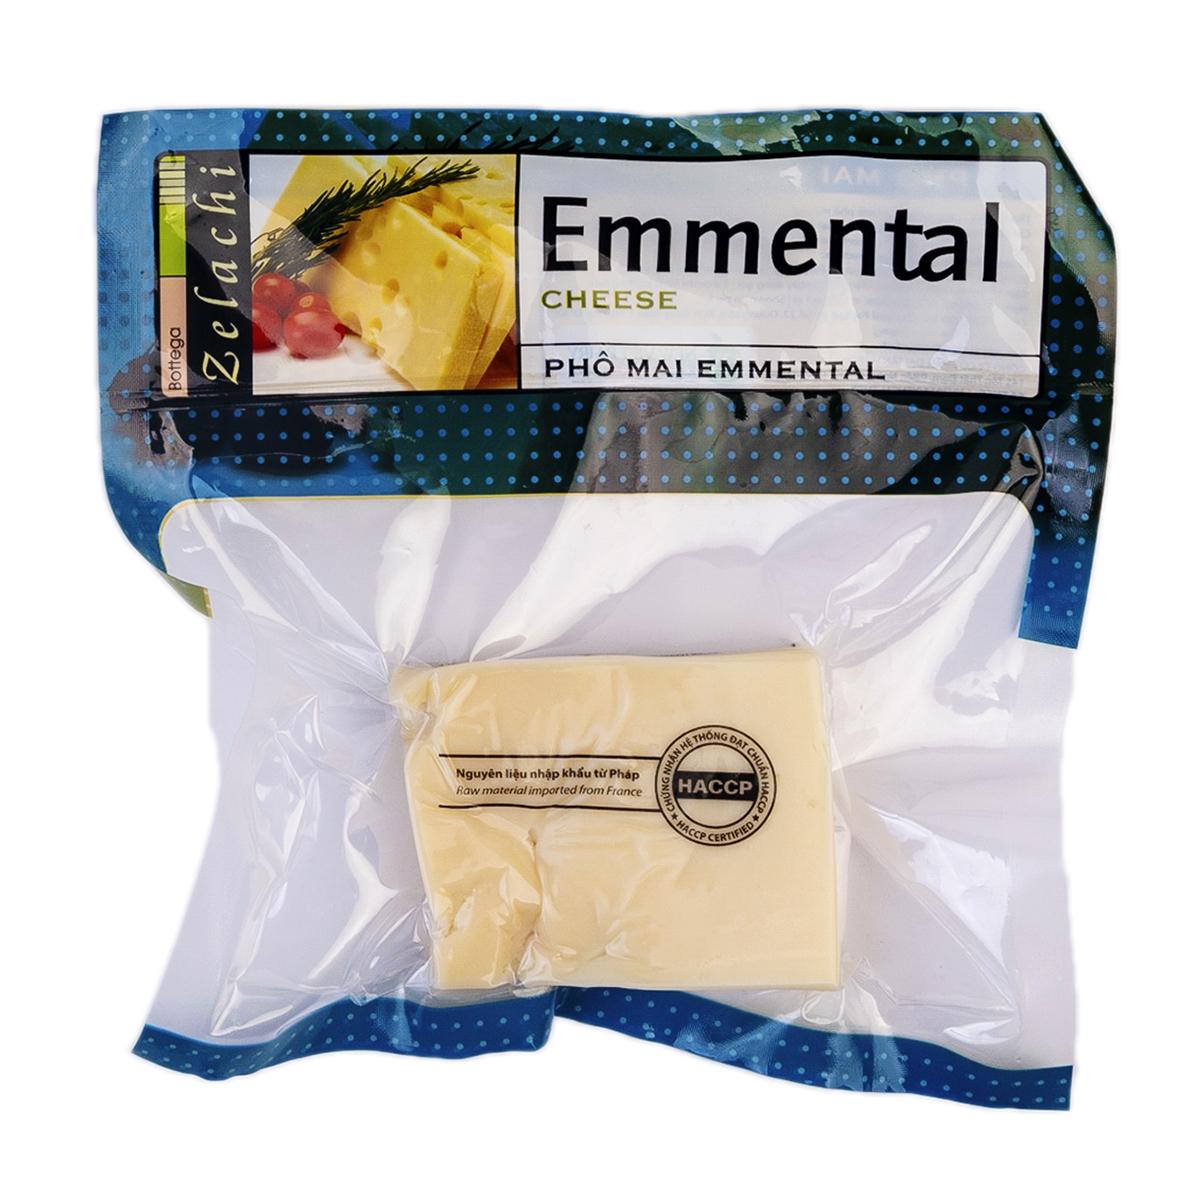 Cheese Emmental Bottega Zelachi 100g - Phô mai Emmental Bottega Zelachi 100g - Sản phẩm hữu cơ, nhập khẩu